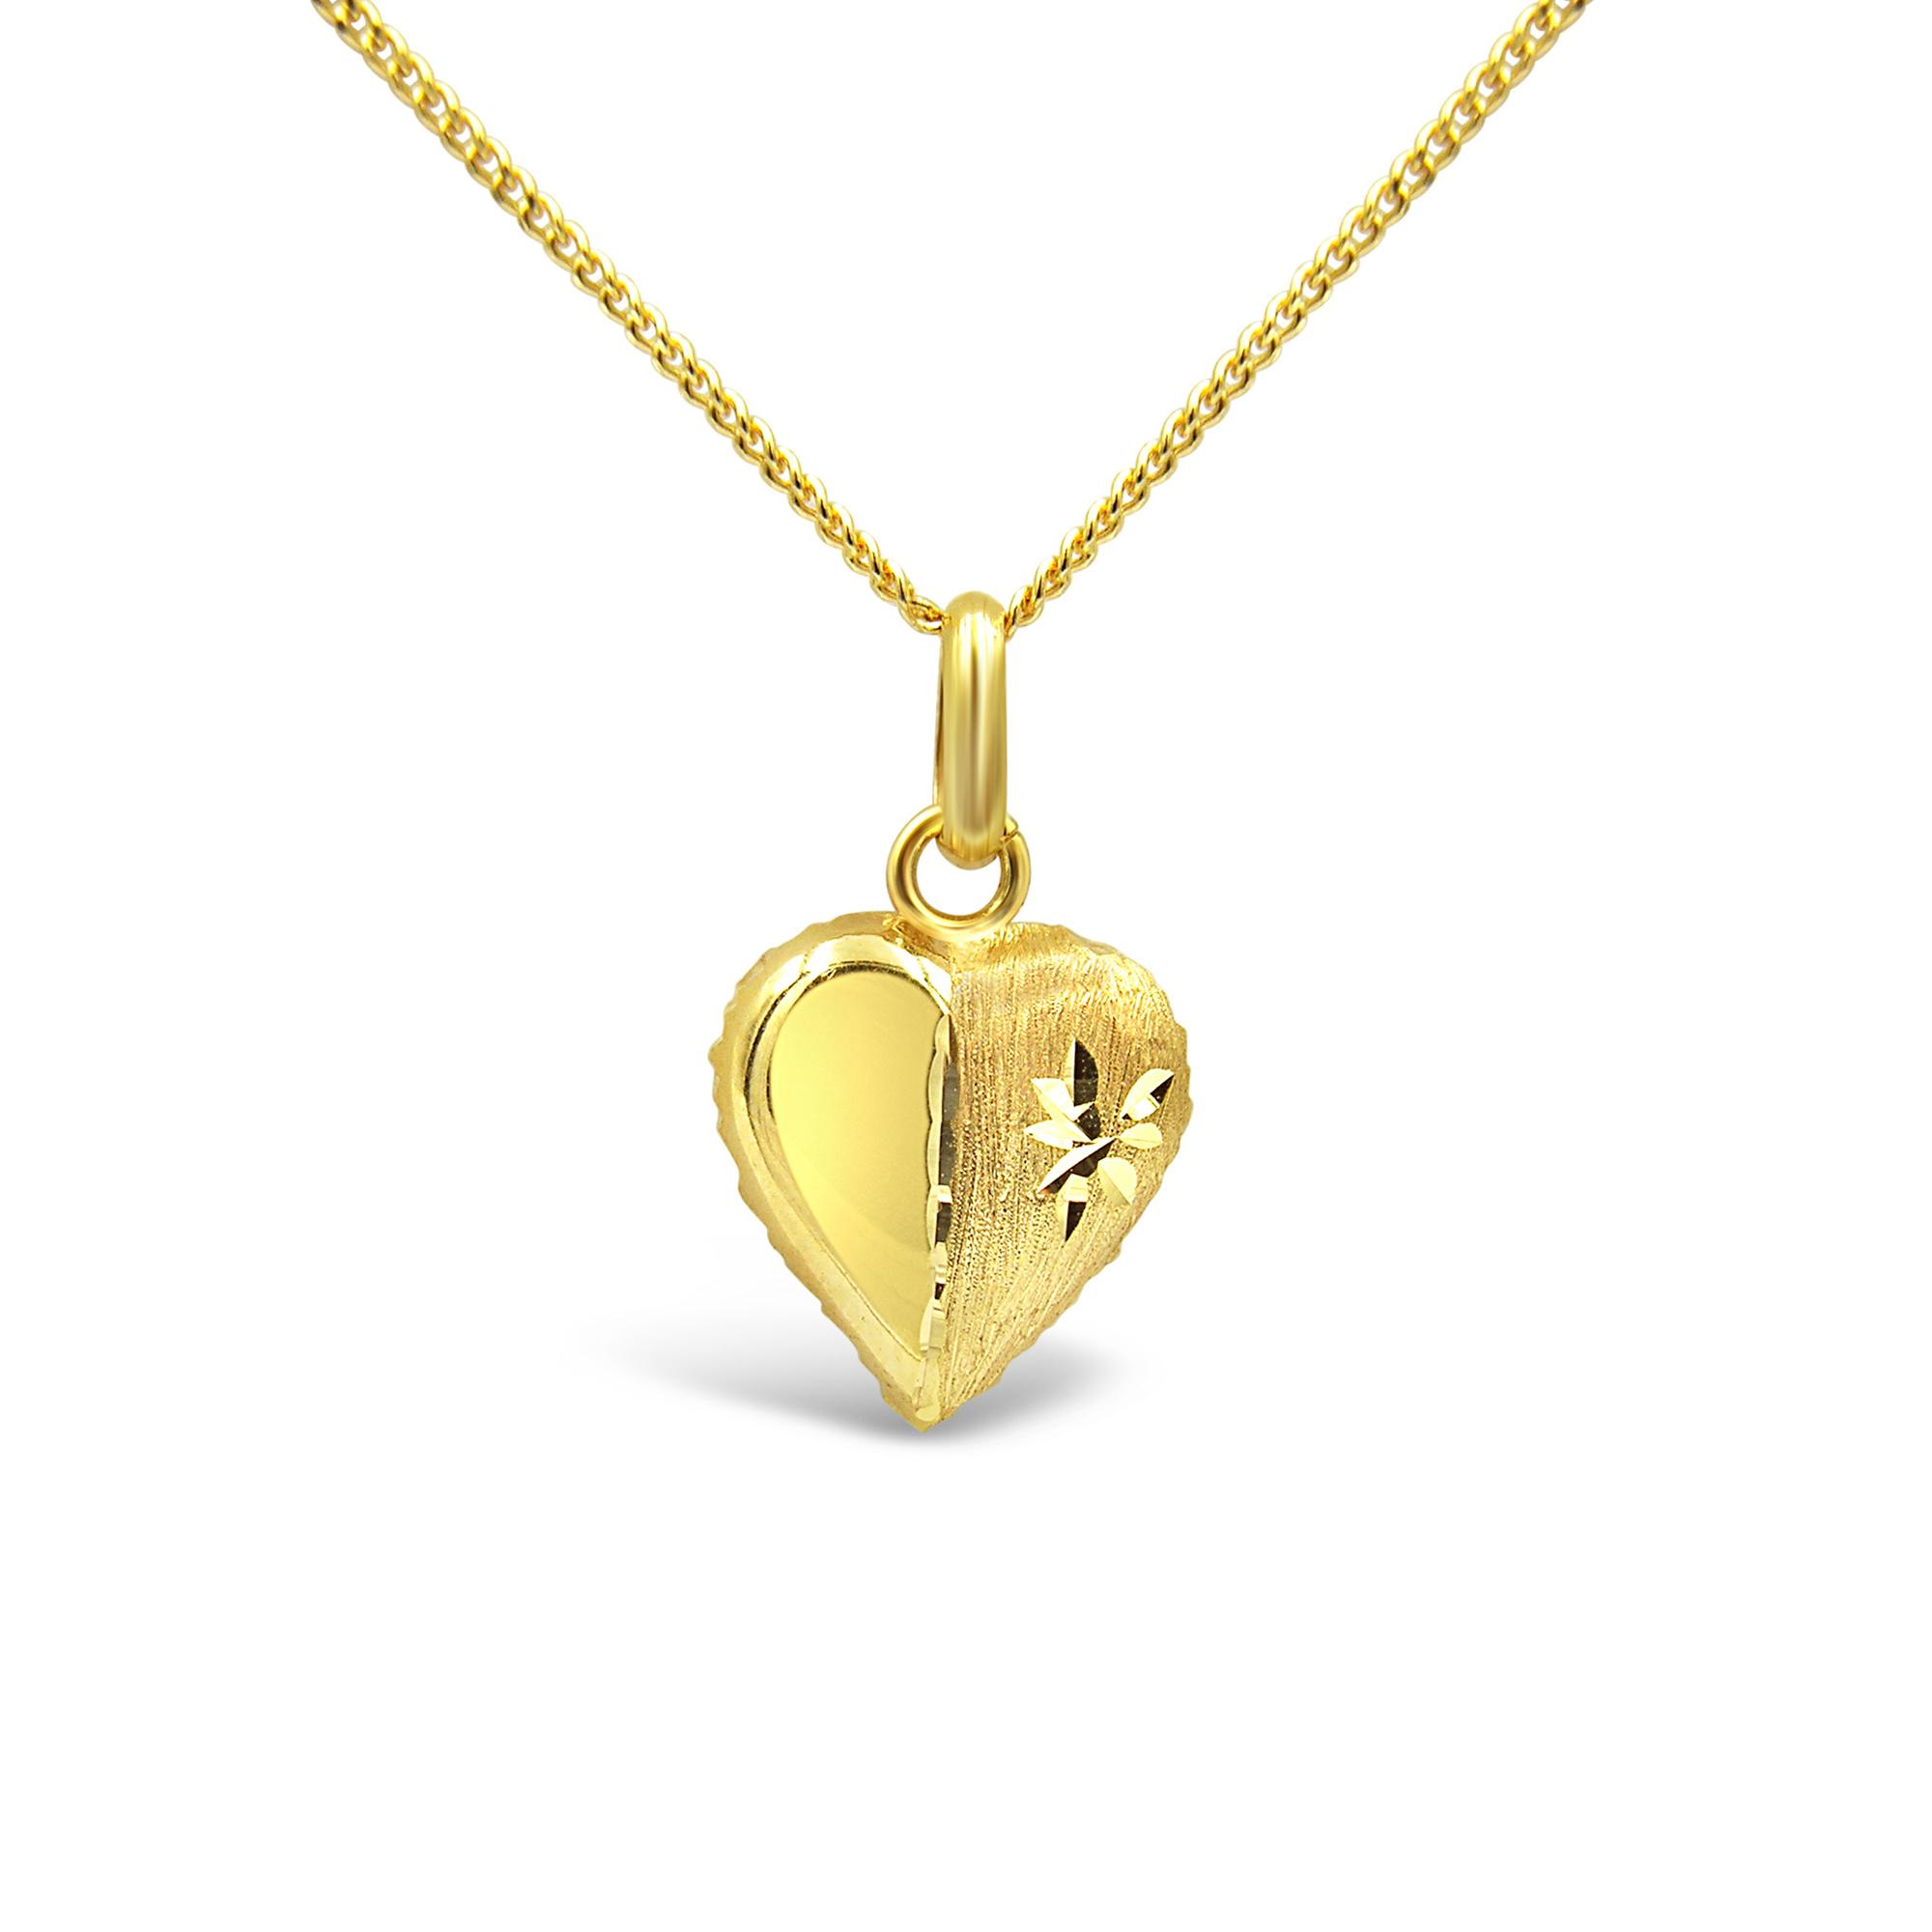 18 karat yellow gold heart pendant with matt & shiny finish